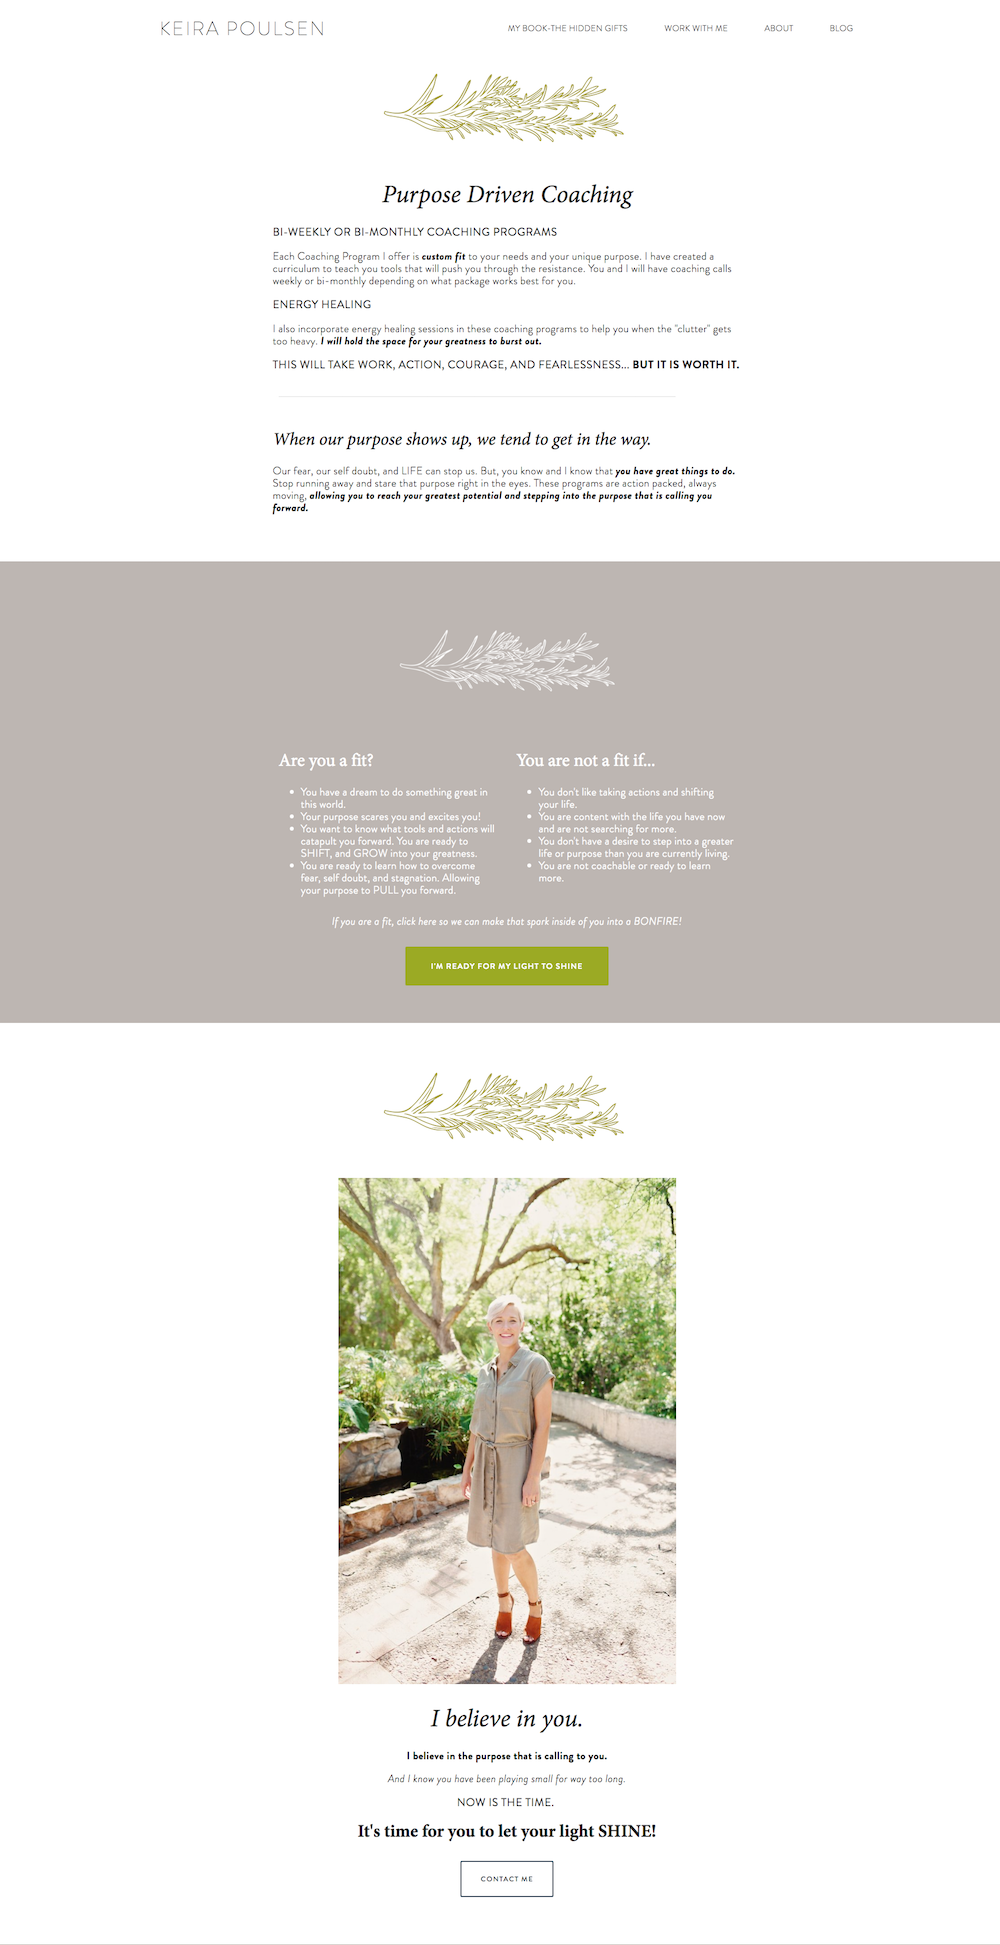 keira-poulsen-website-a3.png